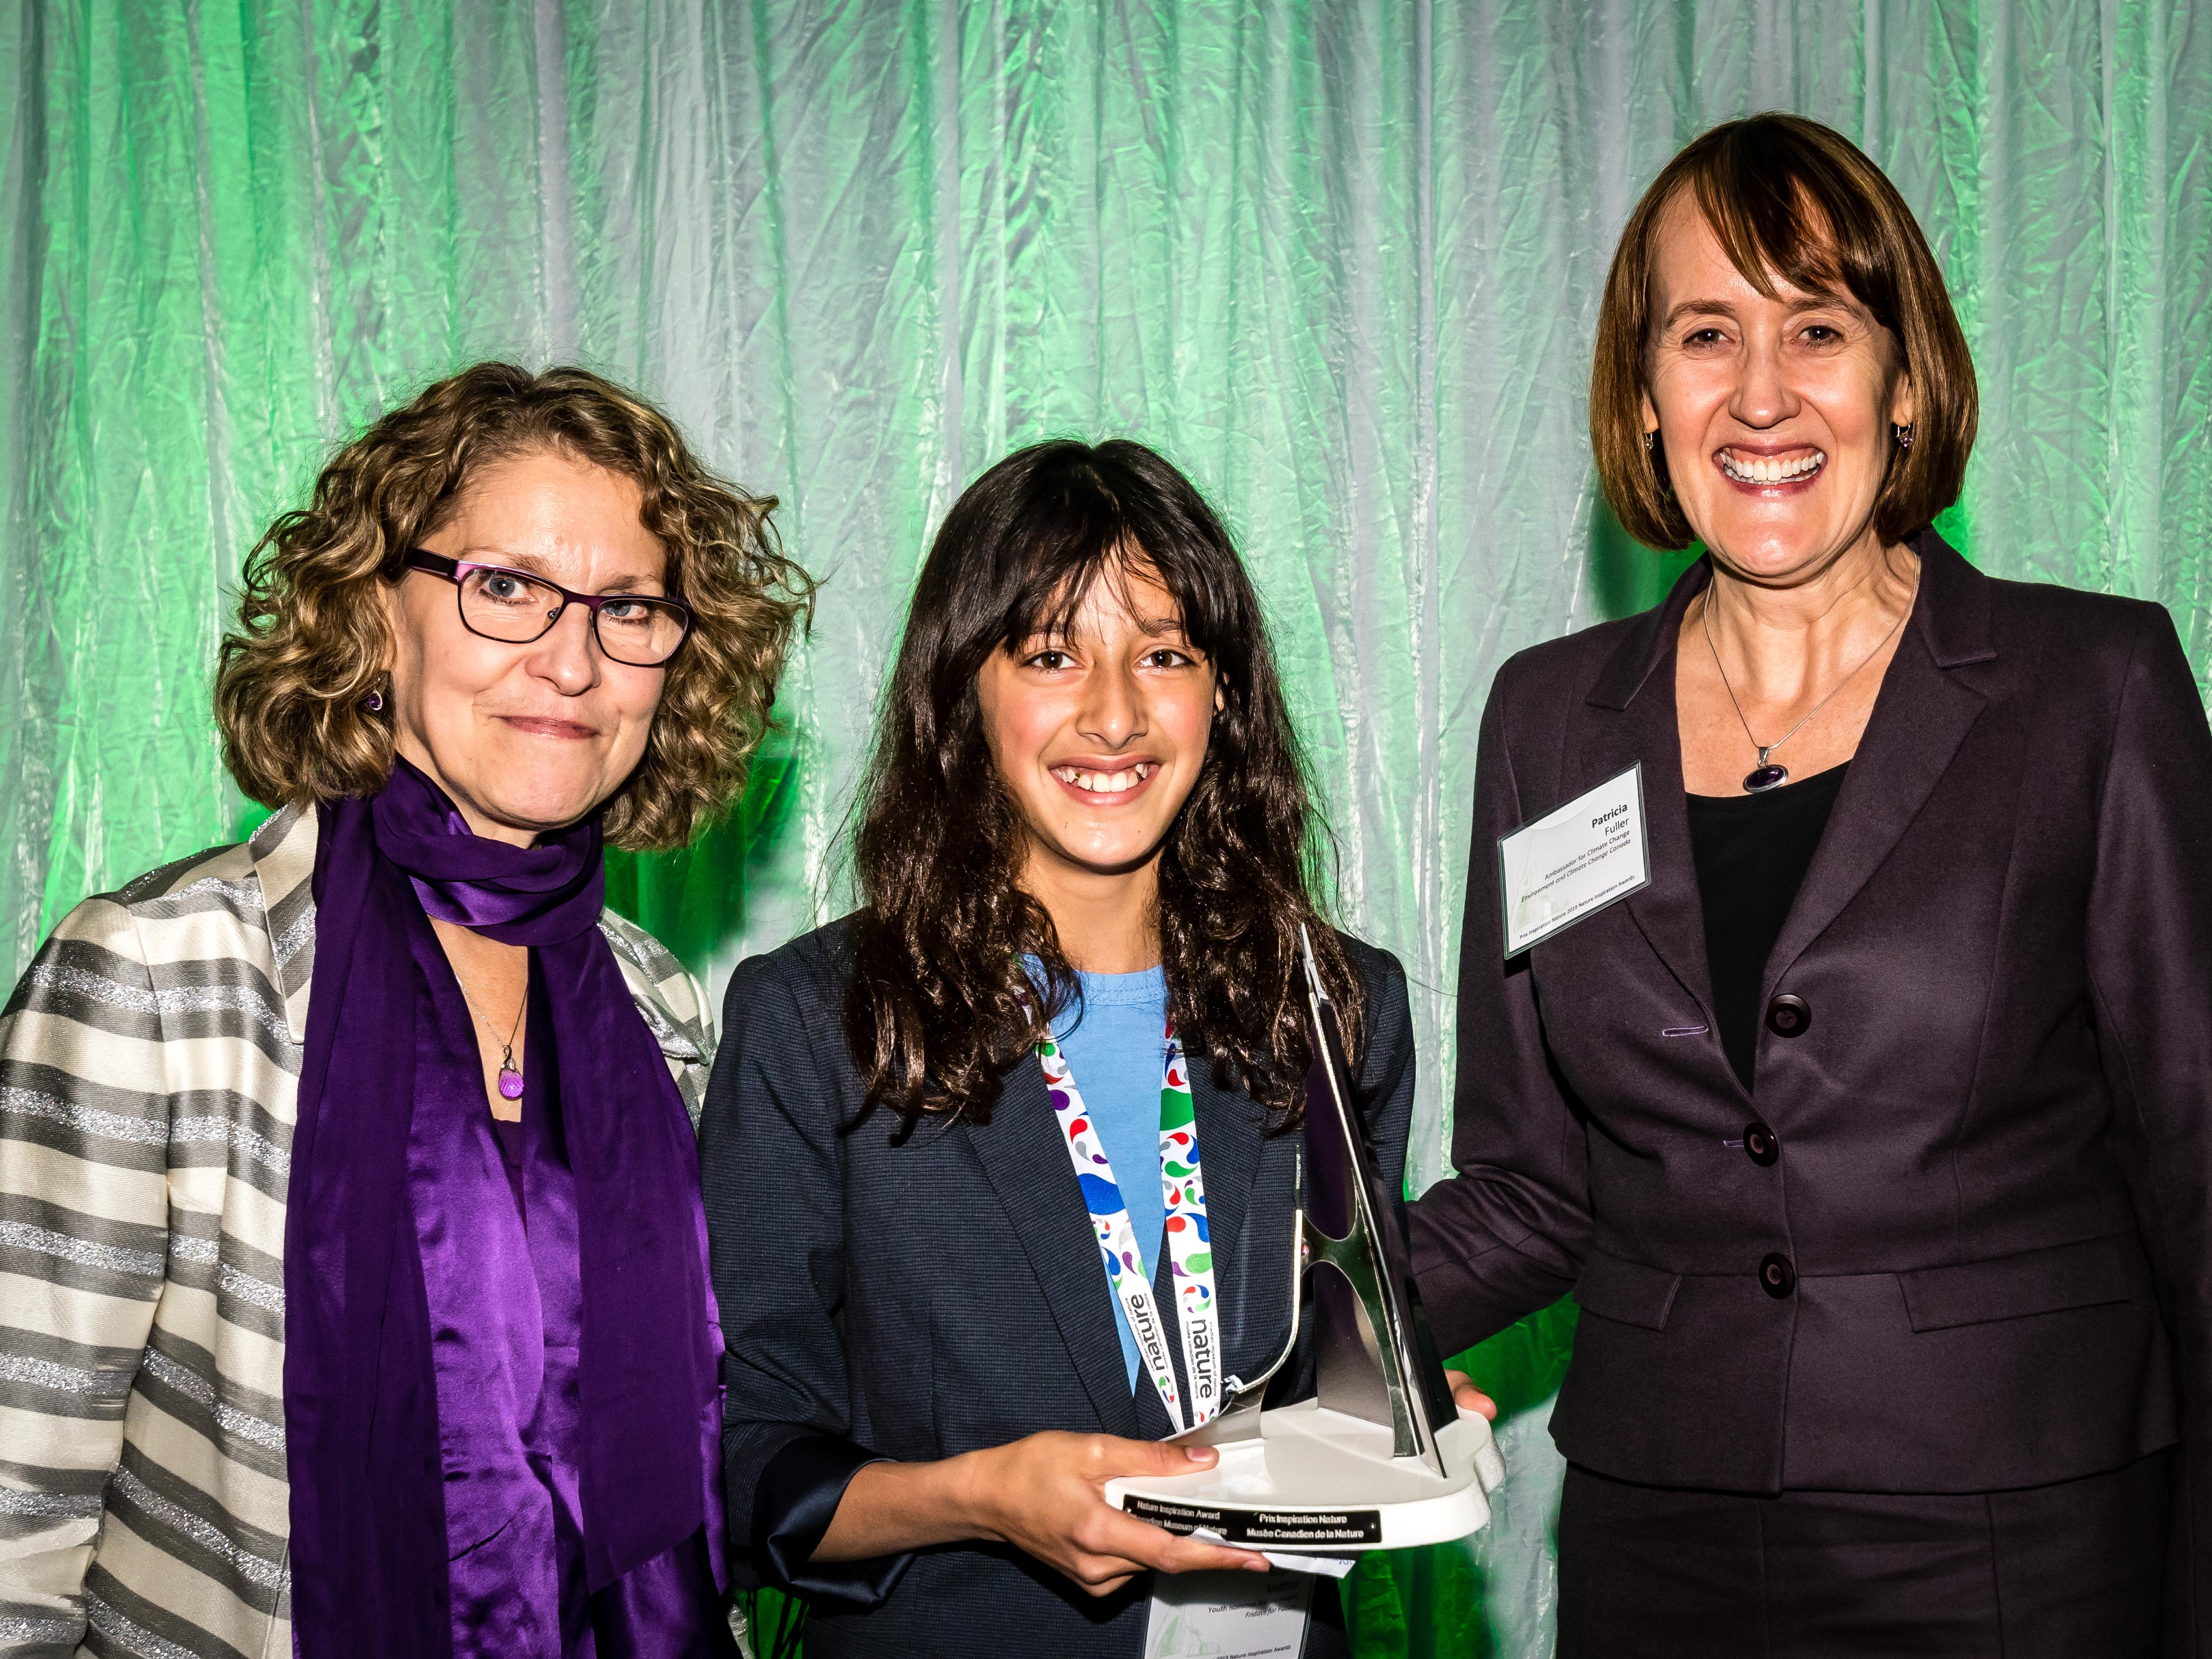 Work of young Sudbury climate activist Sophia Mathur honoured in Ottawa